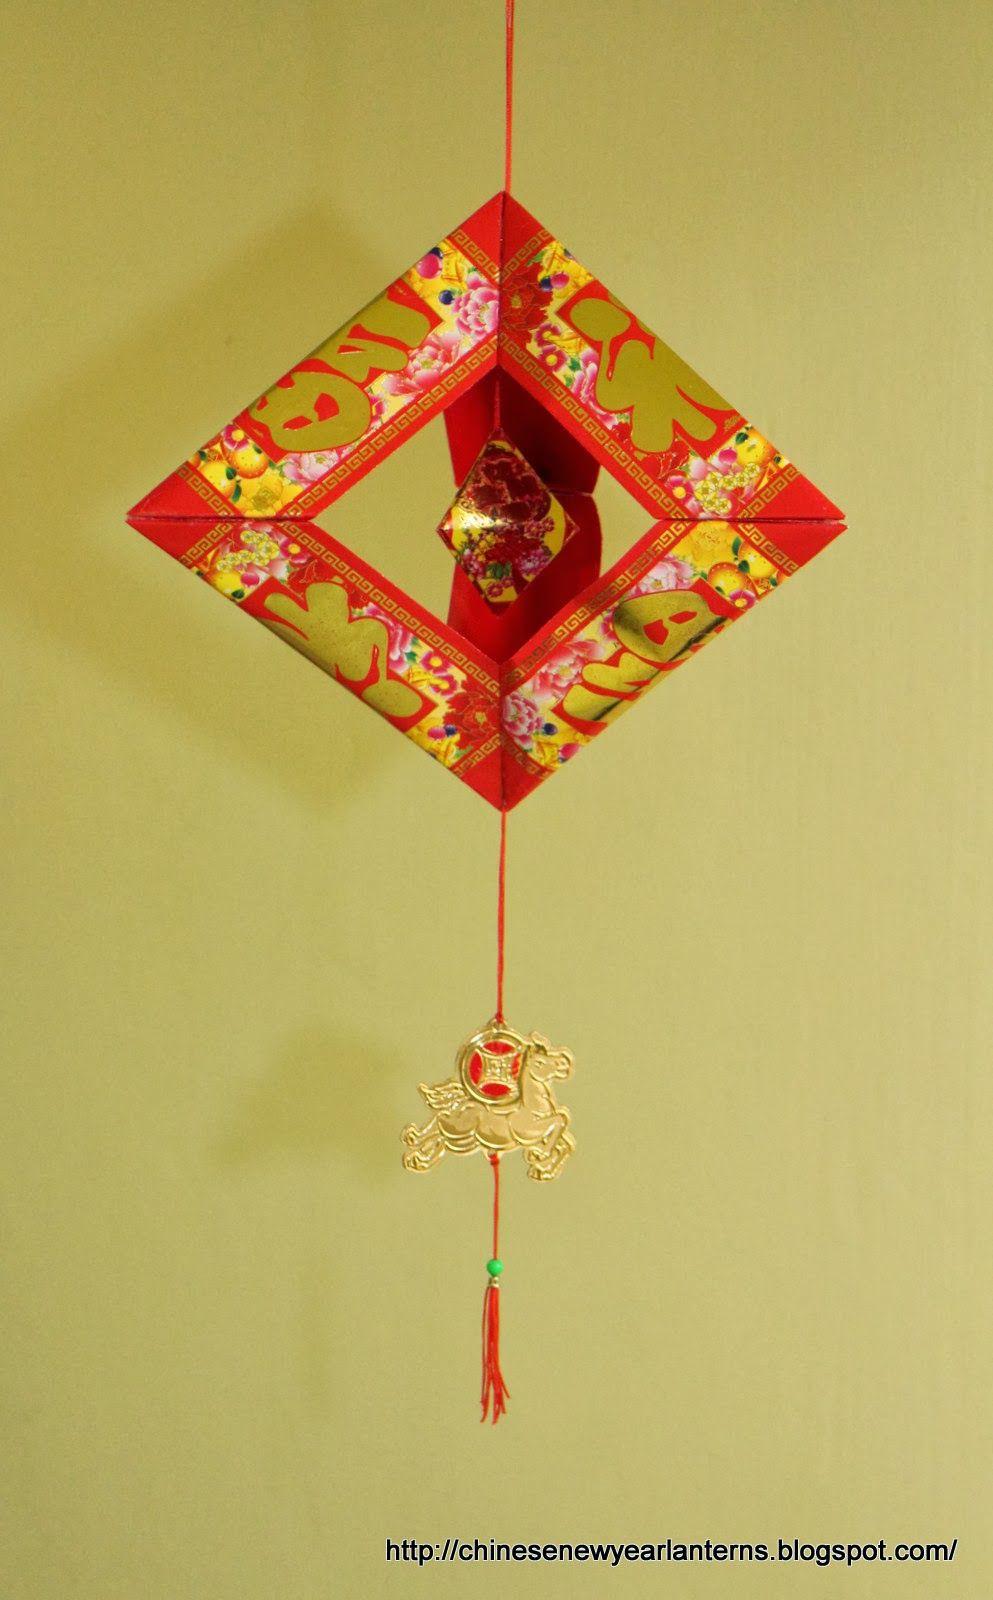 Chinese New Year Lanterns 红包灯笼手工制作 | CNY, red envelopes ...